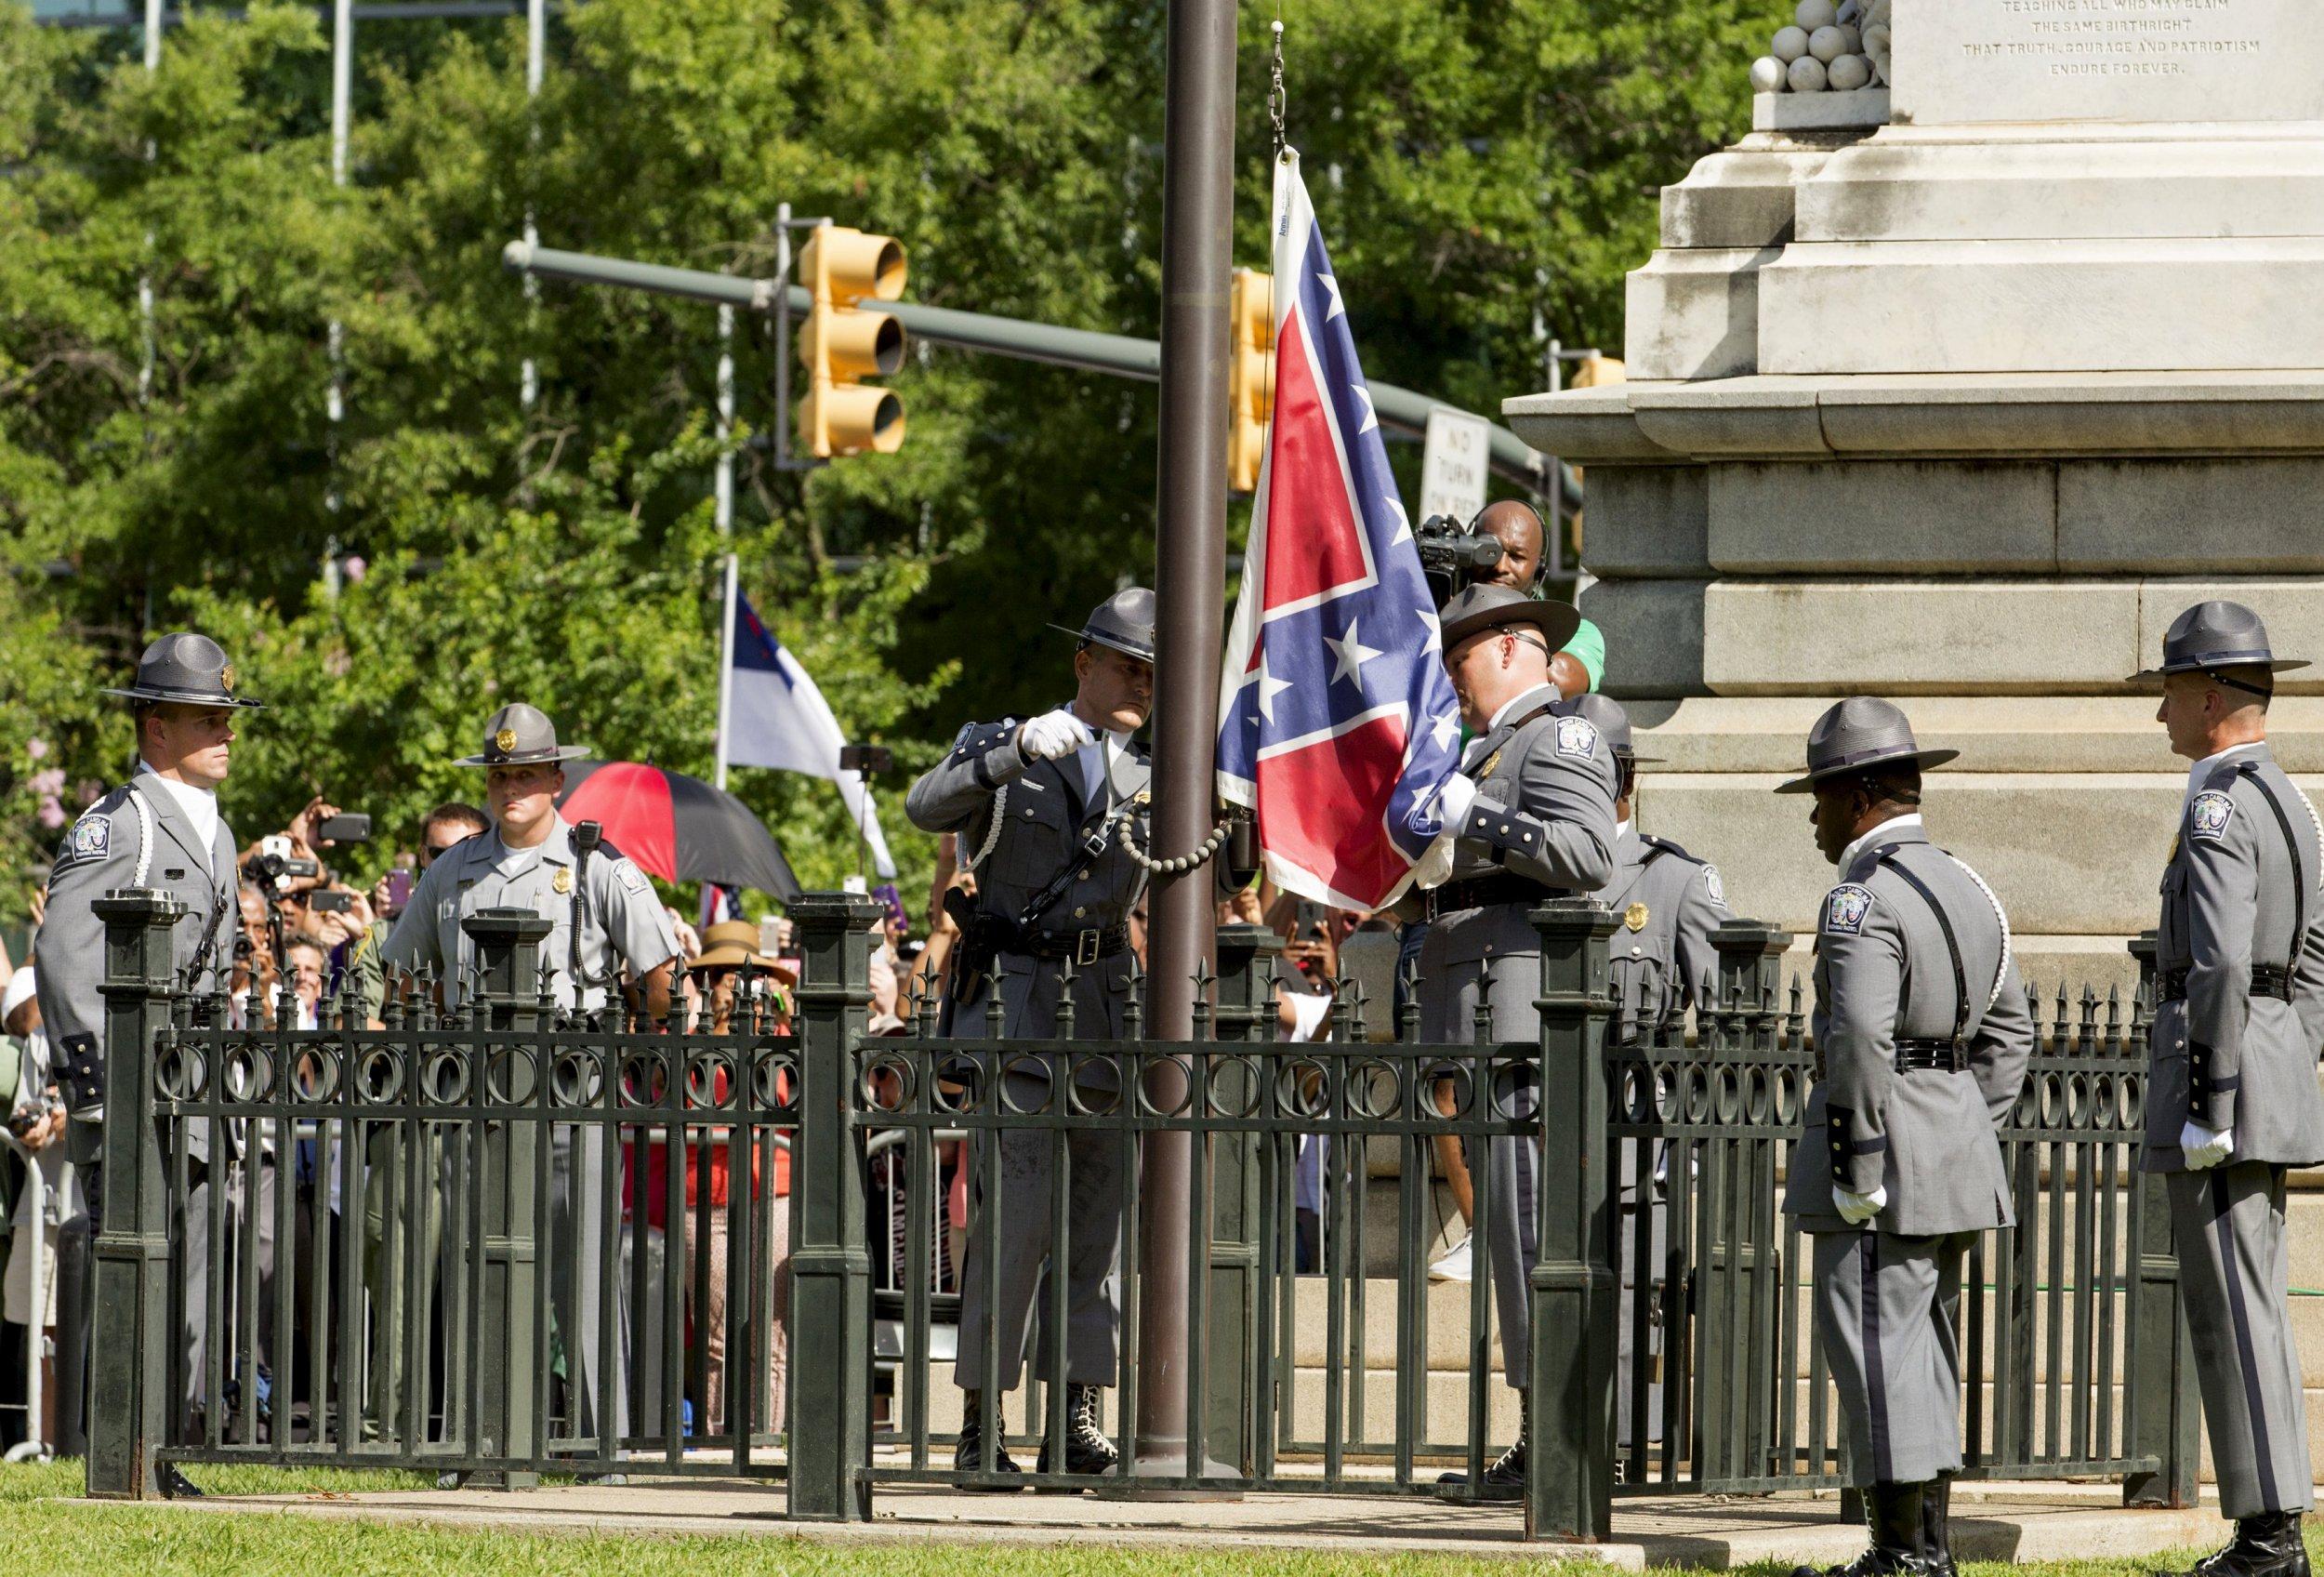 Confederate Flag Comes Down in South Carolina